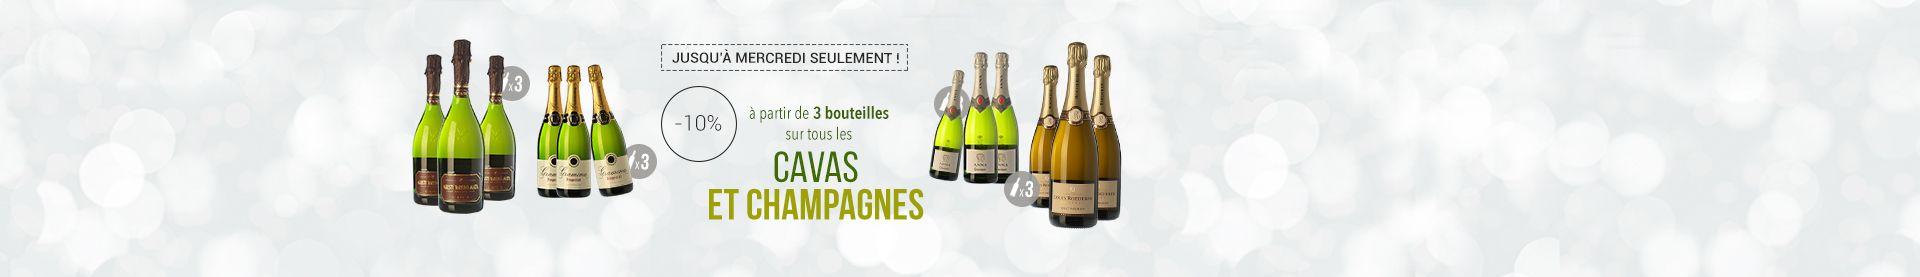 Cavas et Champagnes